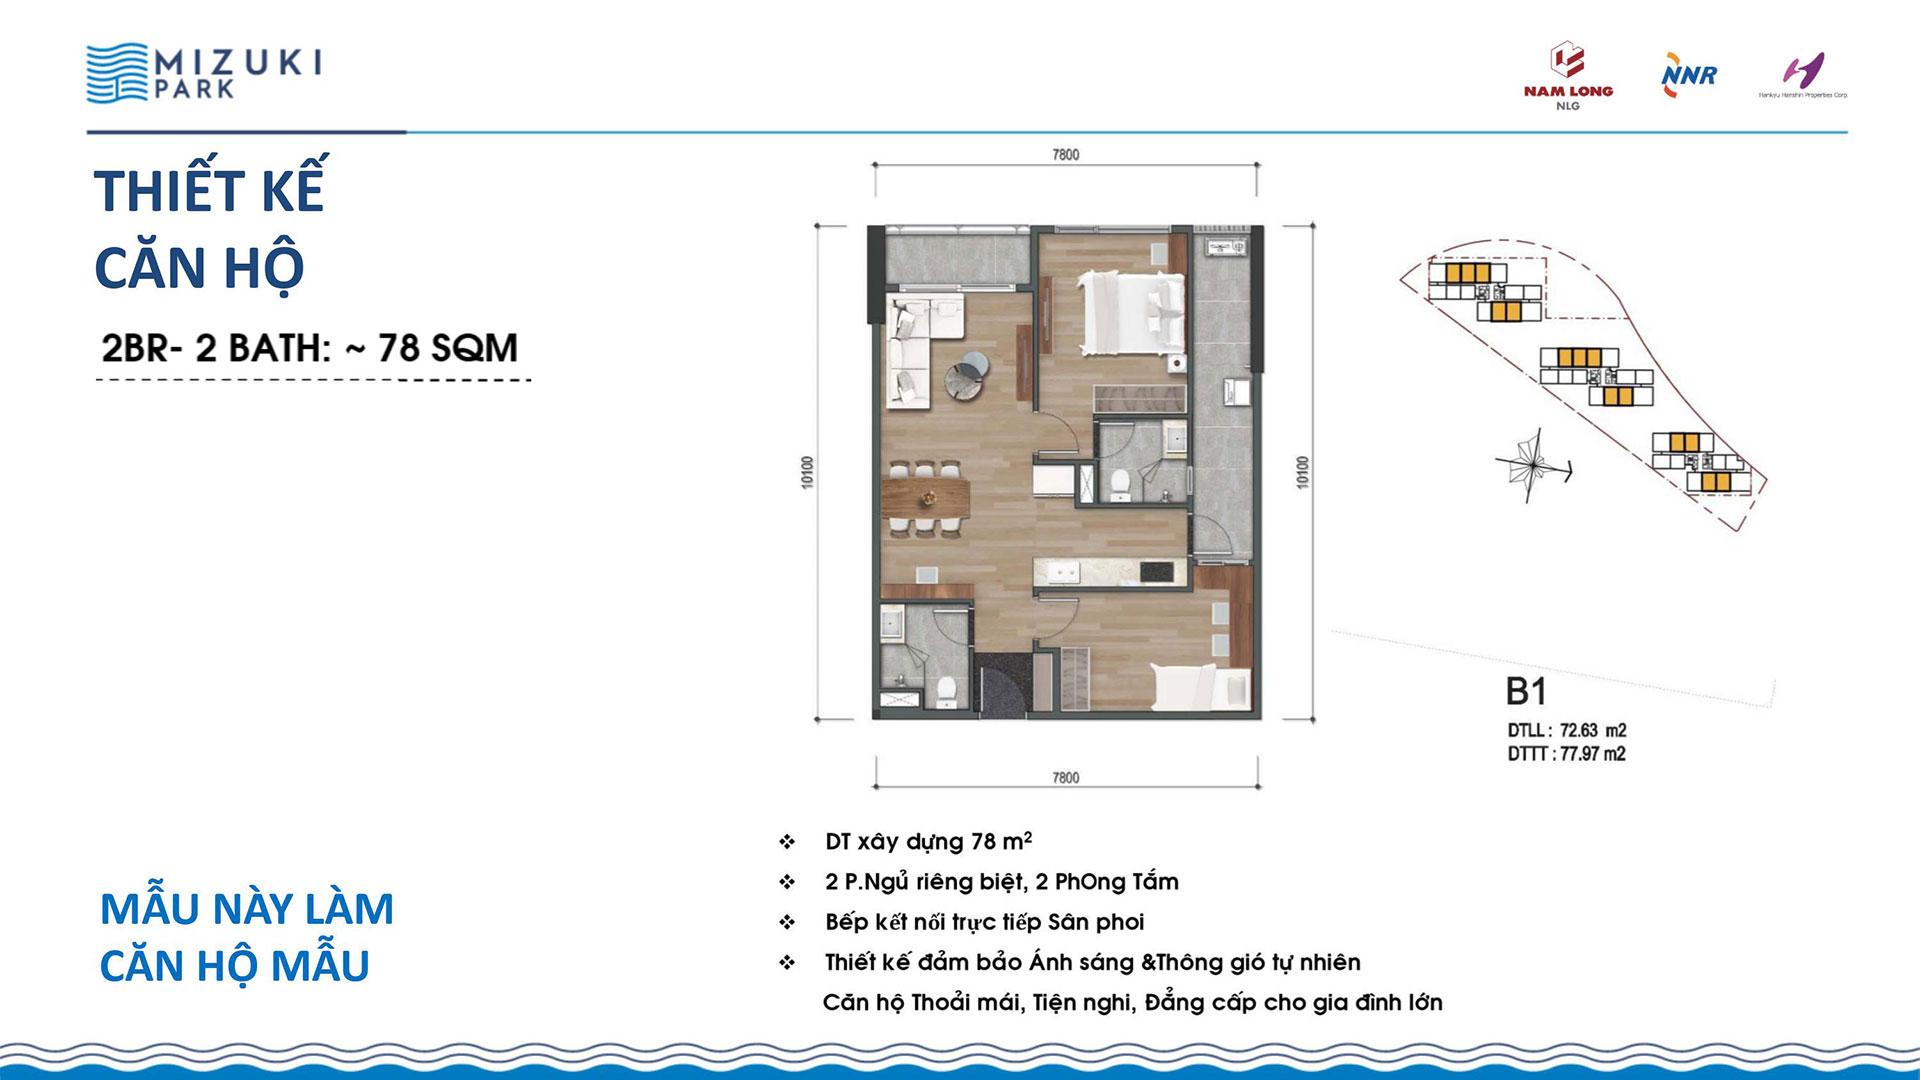 Thiết kế căn hộ Mizuki Park 78m2